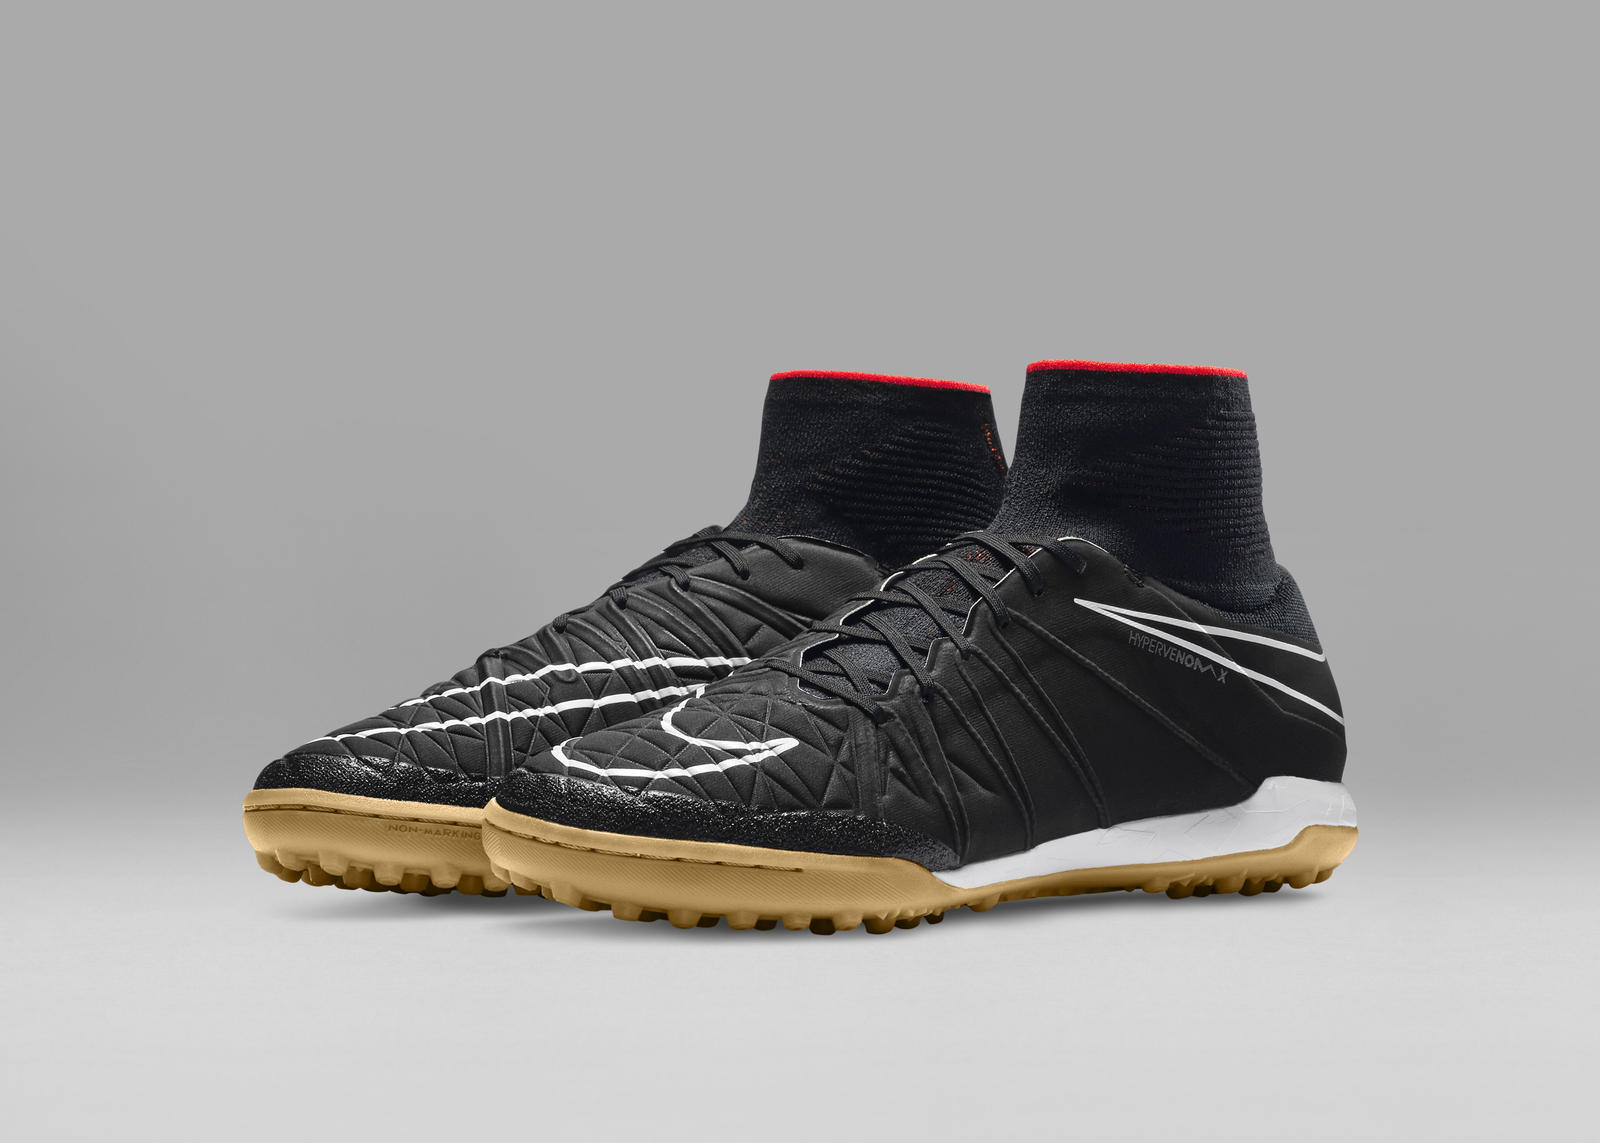 Nike-Football-Soccer_NFX_STREET_HYPERVENOMX_PROXIMO_II_TF_E_PREM